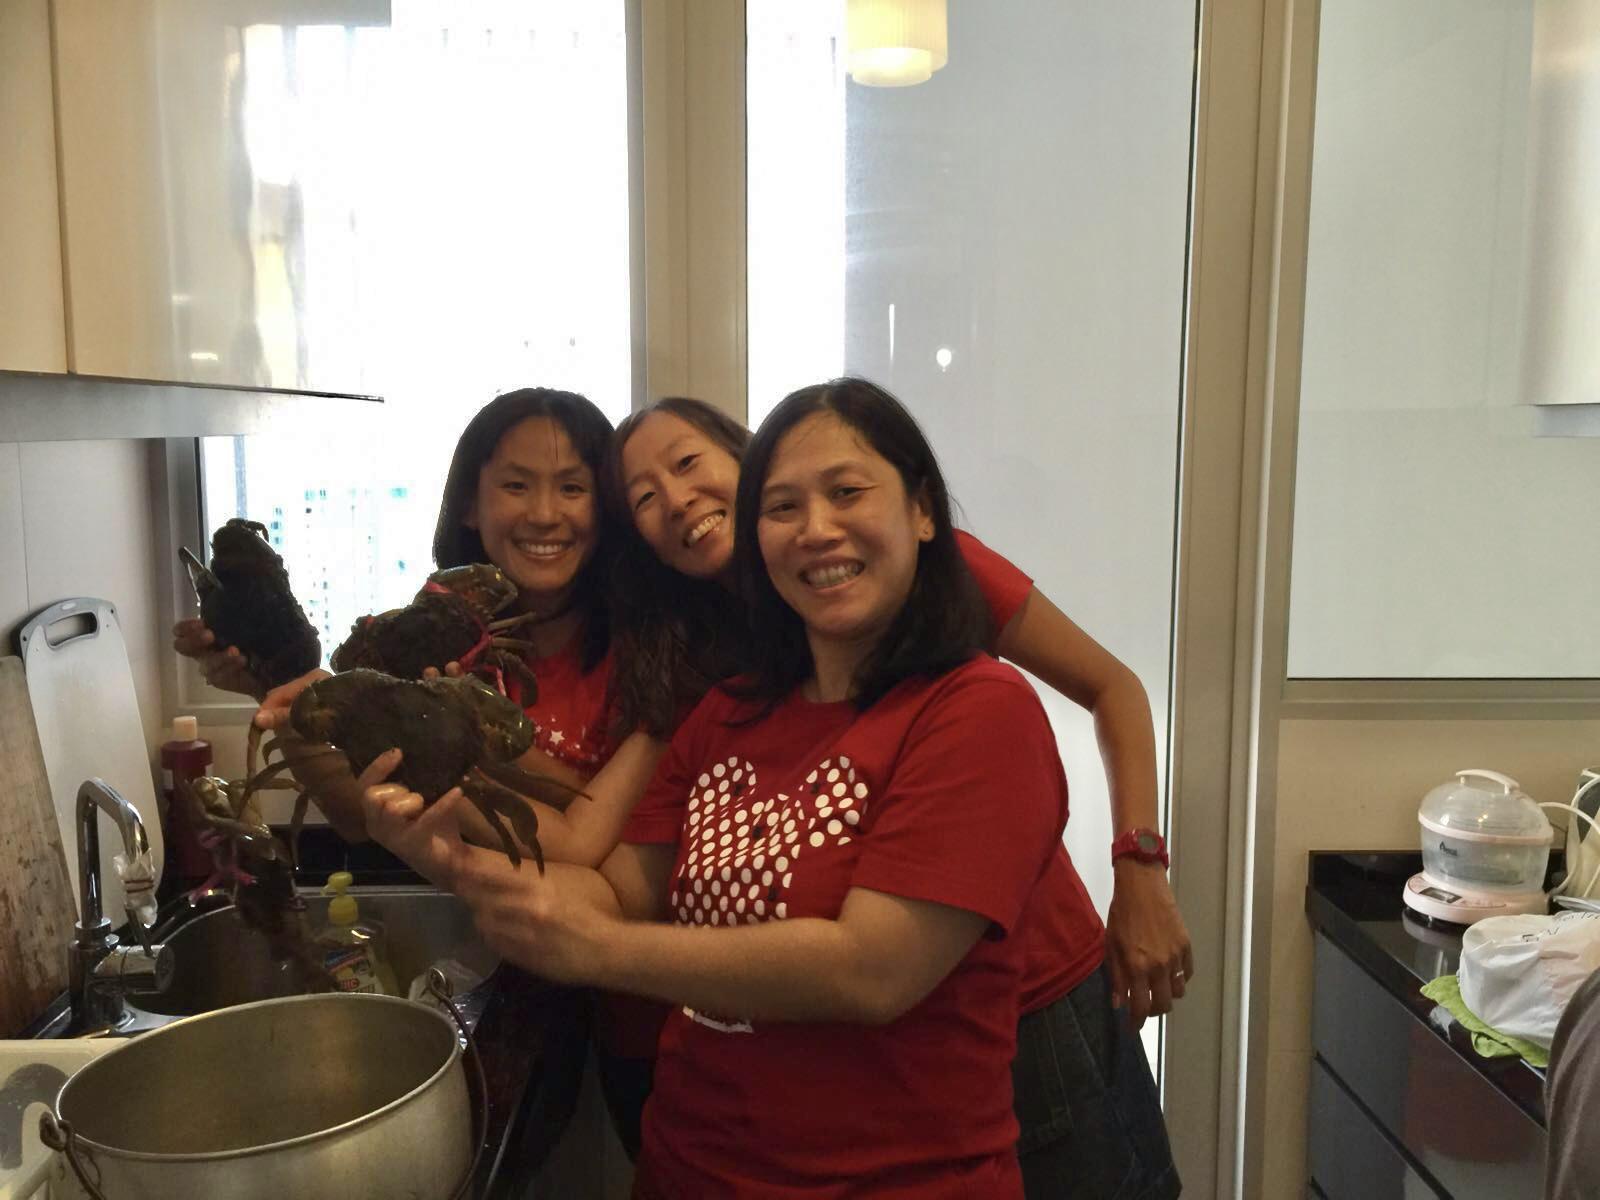 ladies cooking in kitchen